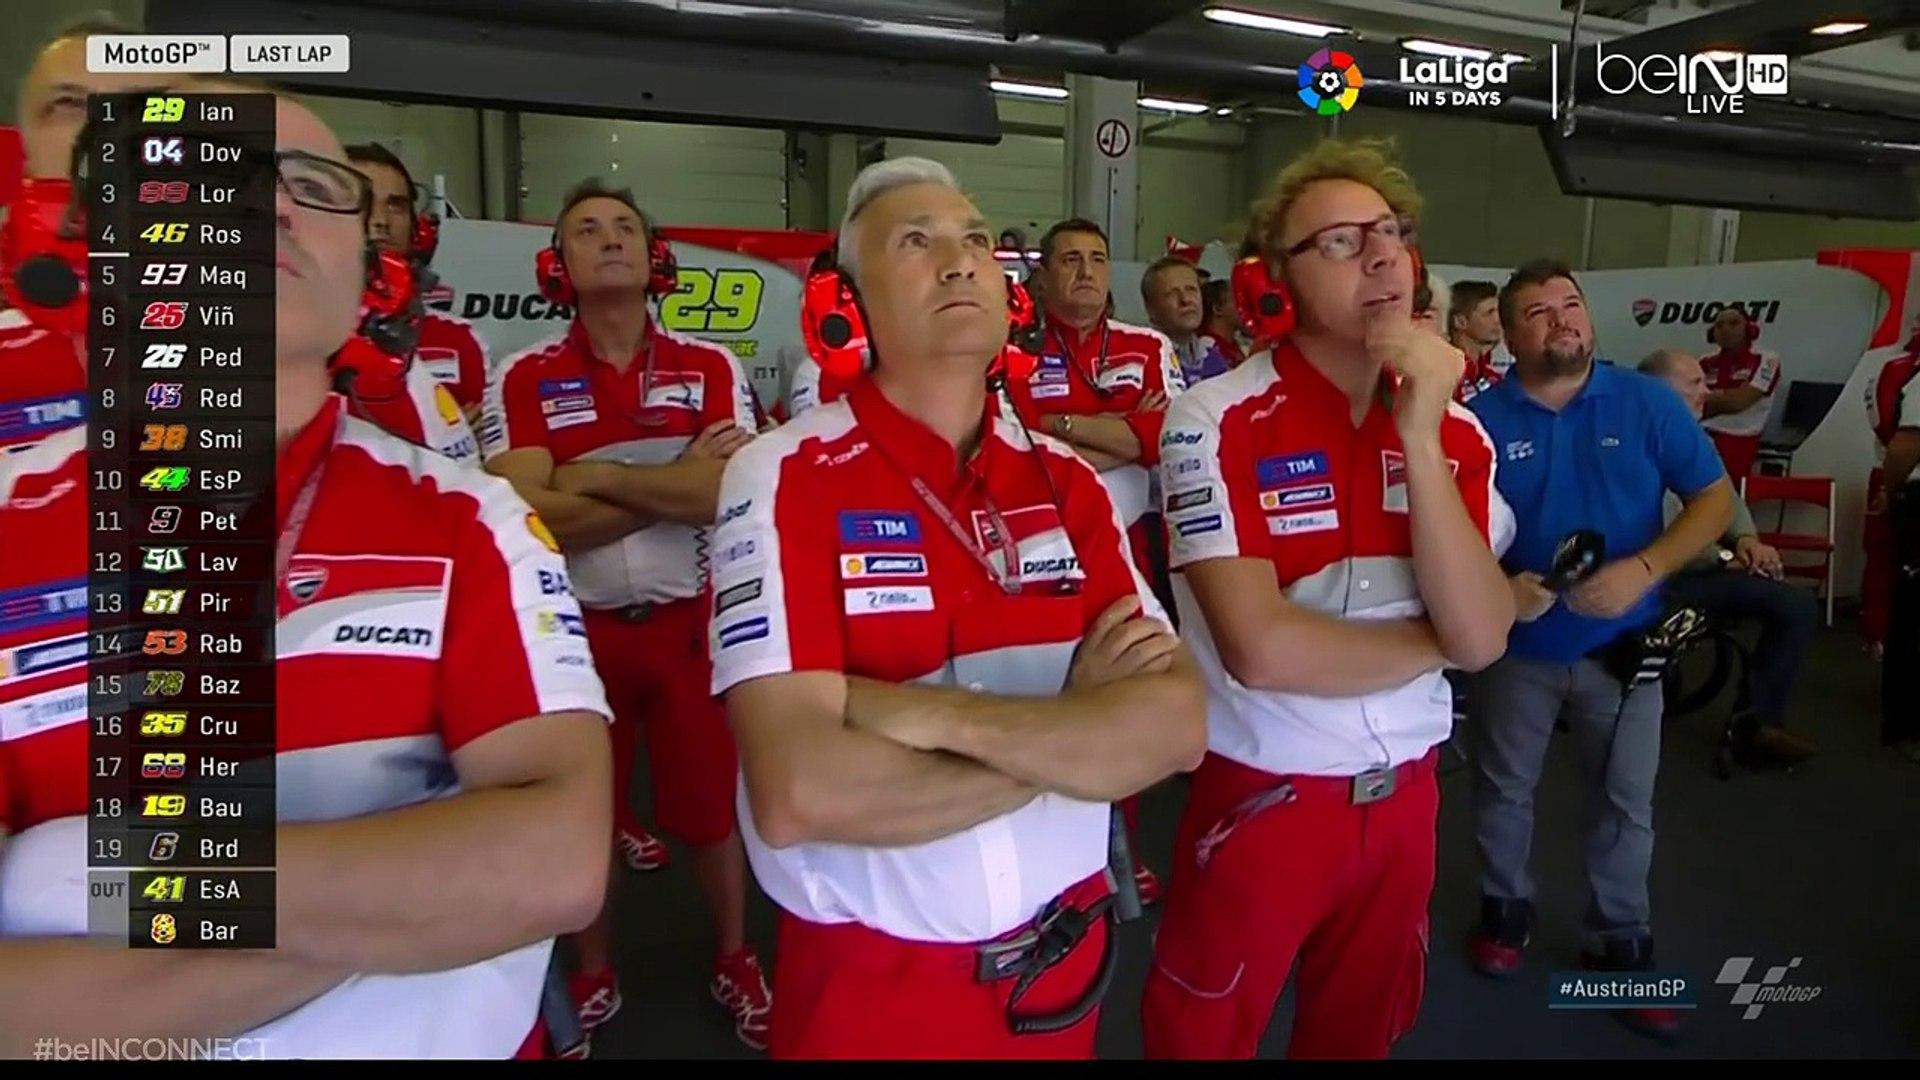 Austrian GP Final Lap